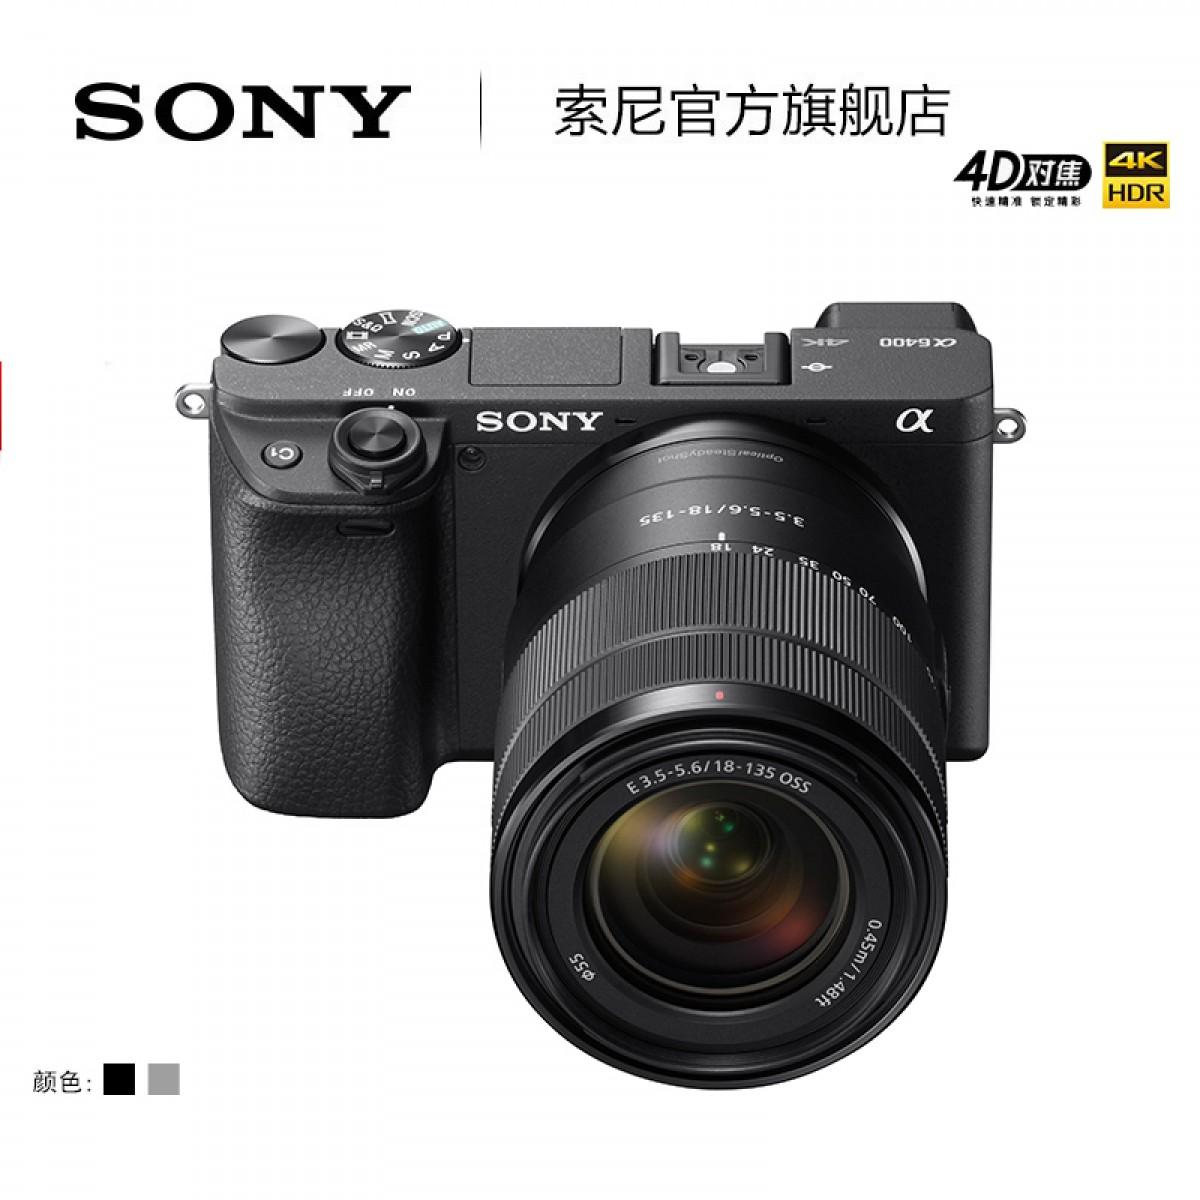 Sony/索尼 ILCE-6400M微单数码相机旅游E18-135mm A6400 VLOG相机